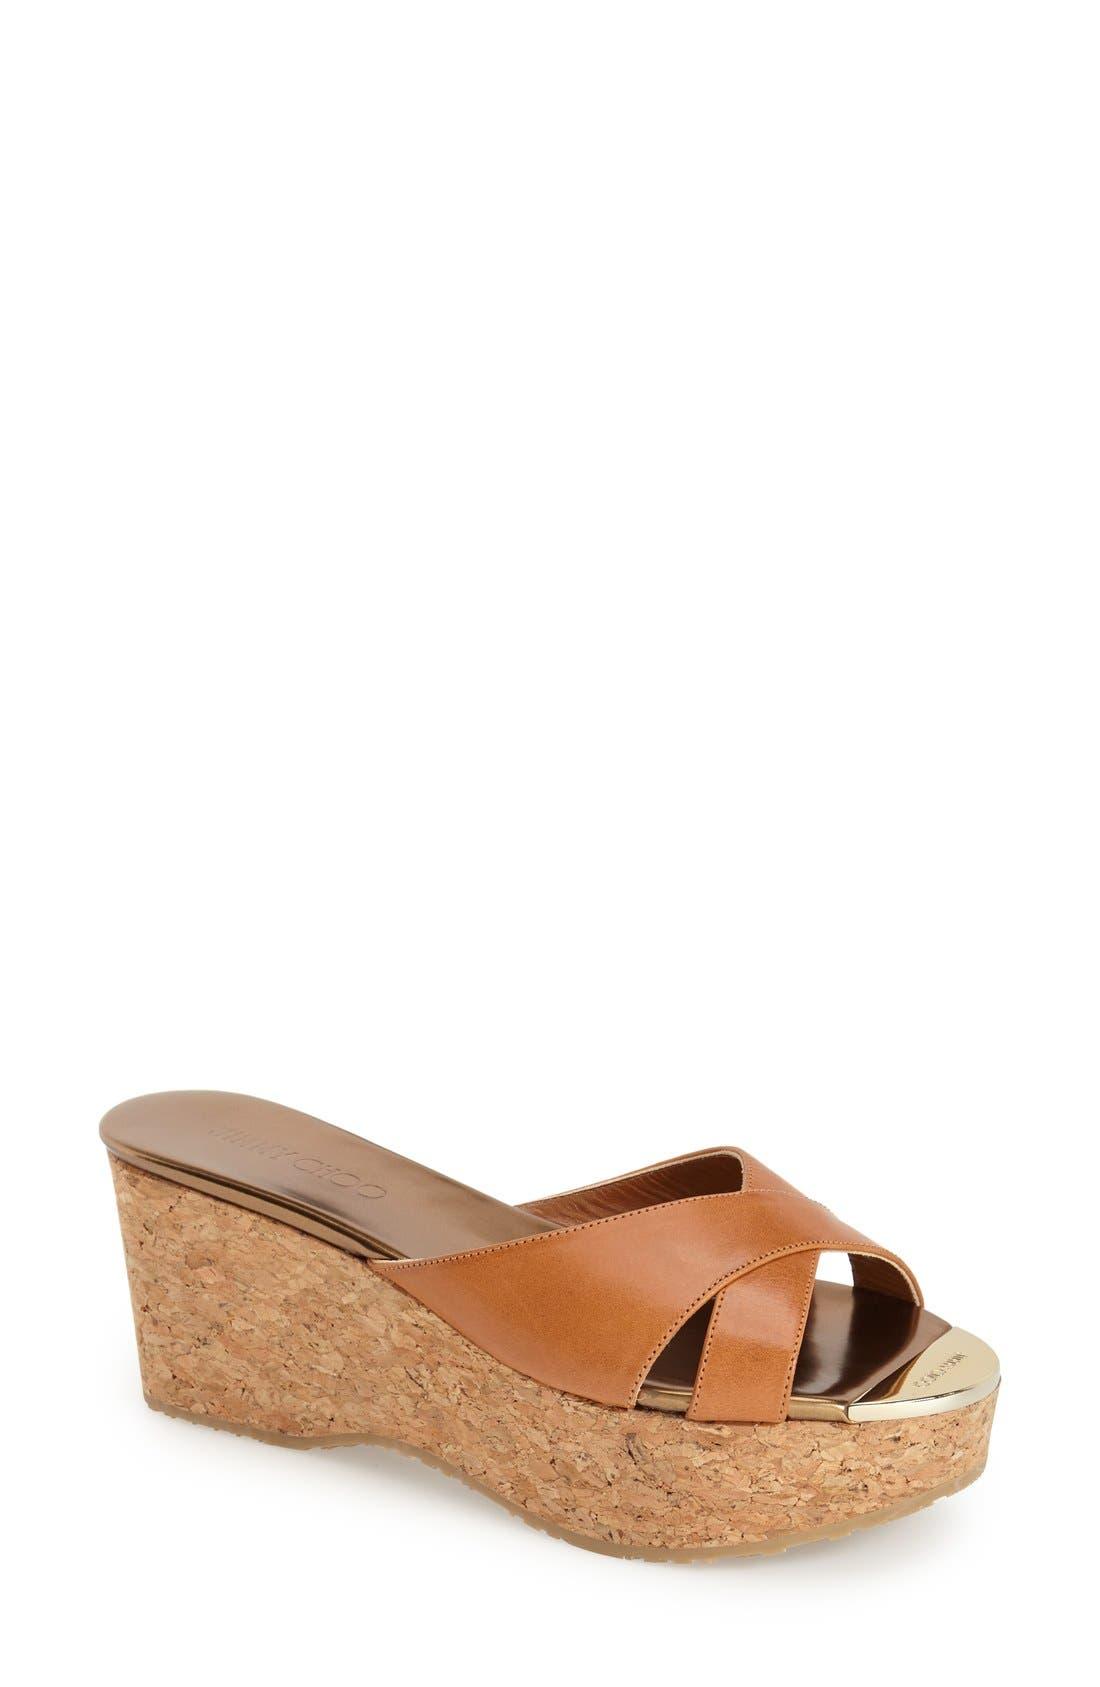 Alternate Image 1 Selected - Jimmy Choo 'Prima' Cork Platform Sandal